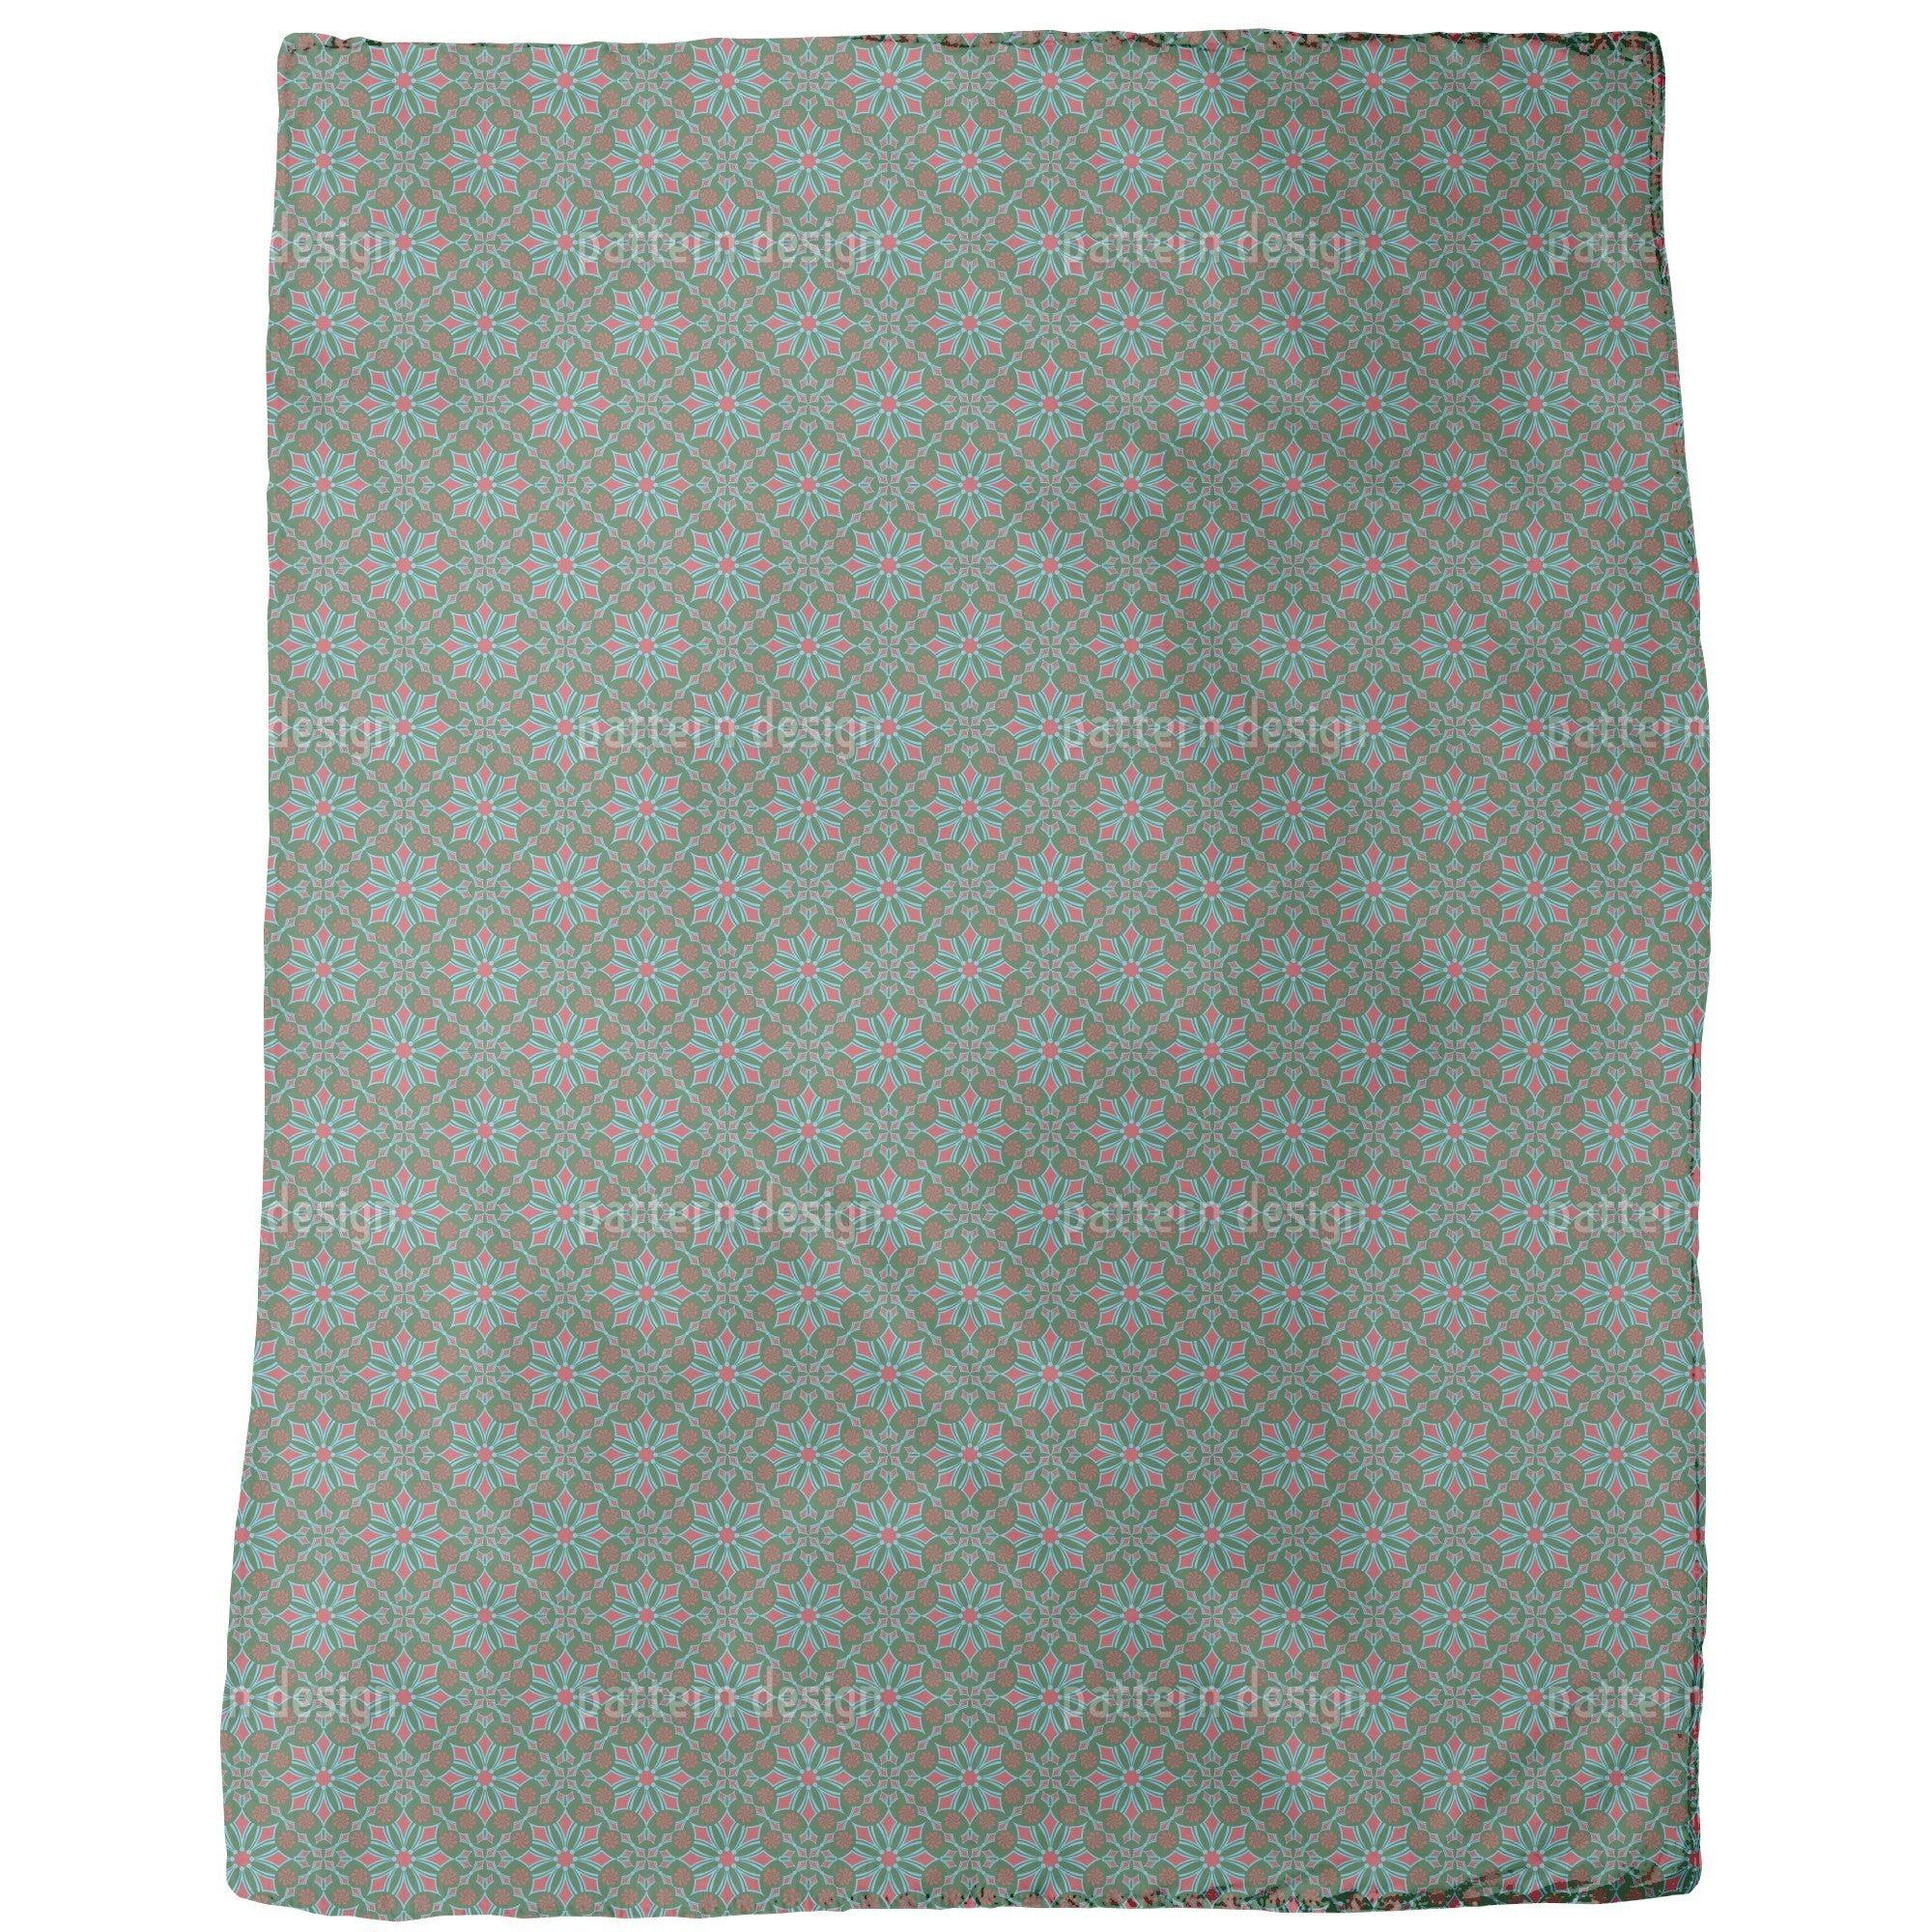 Shop Retro Flowers Fleece Blanket Free Shipping Today Overstock